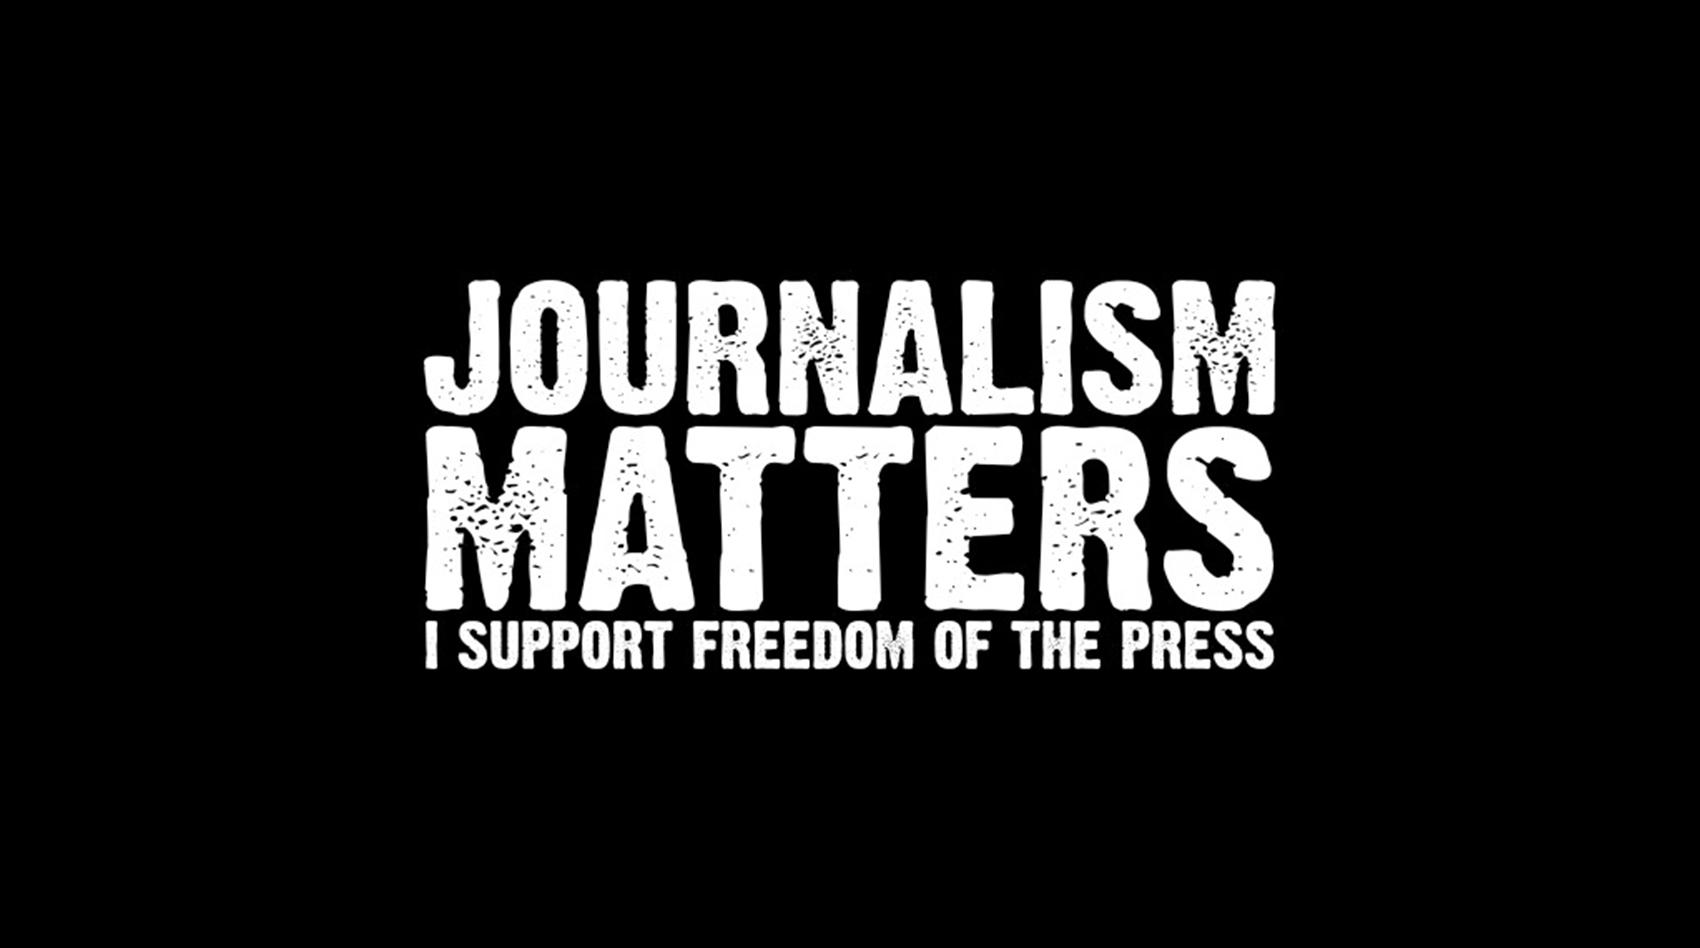 #JournalismMatters